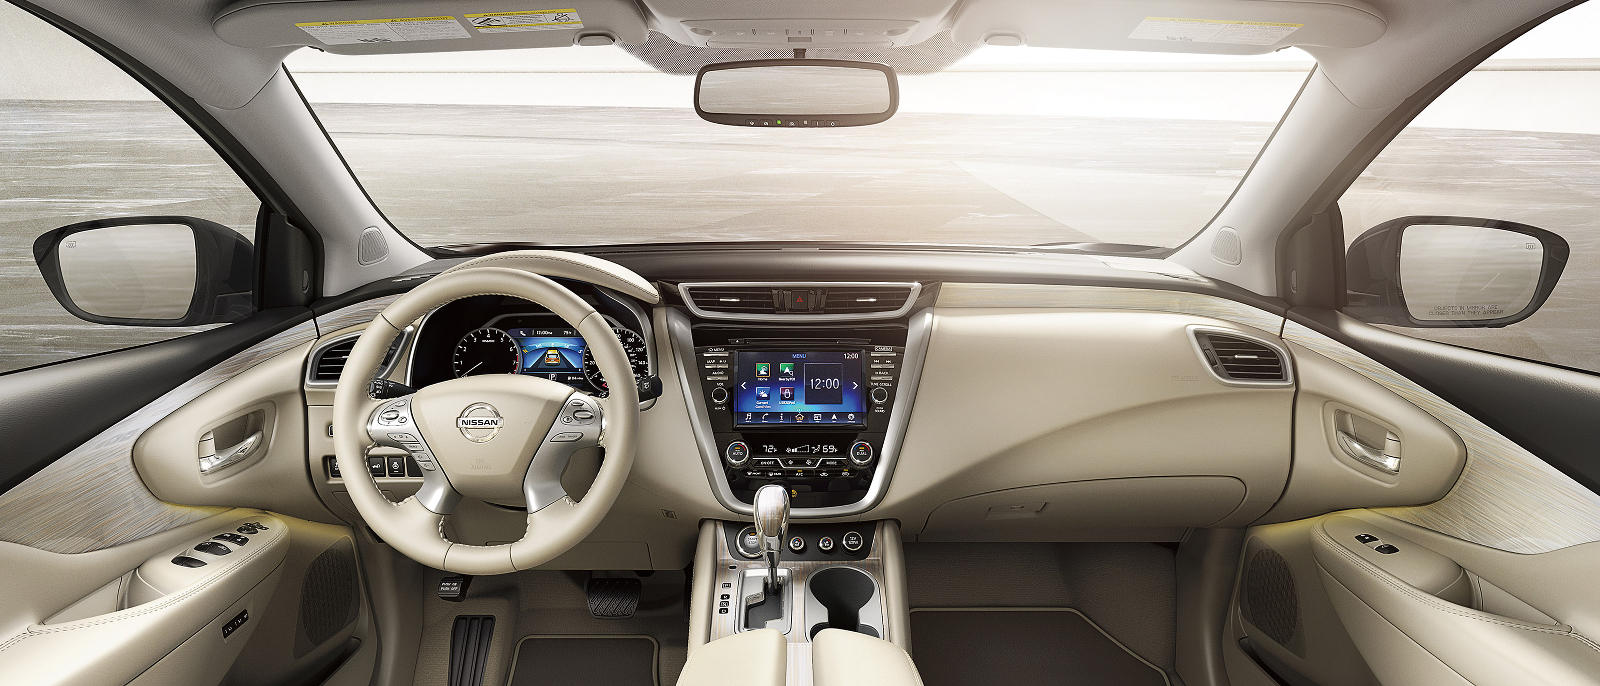 2015 Nissan Murano Interior ...